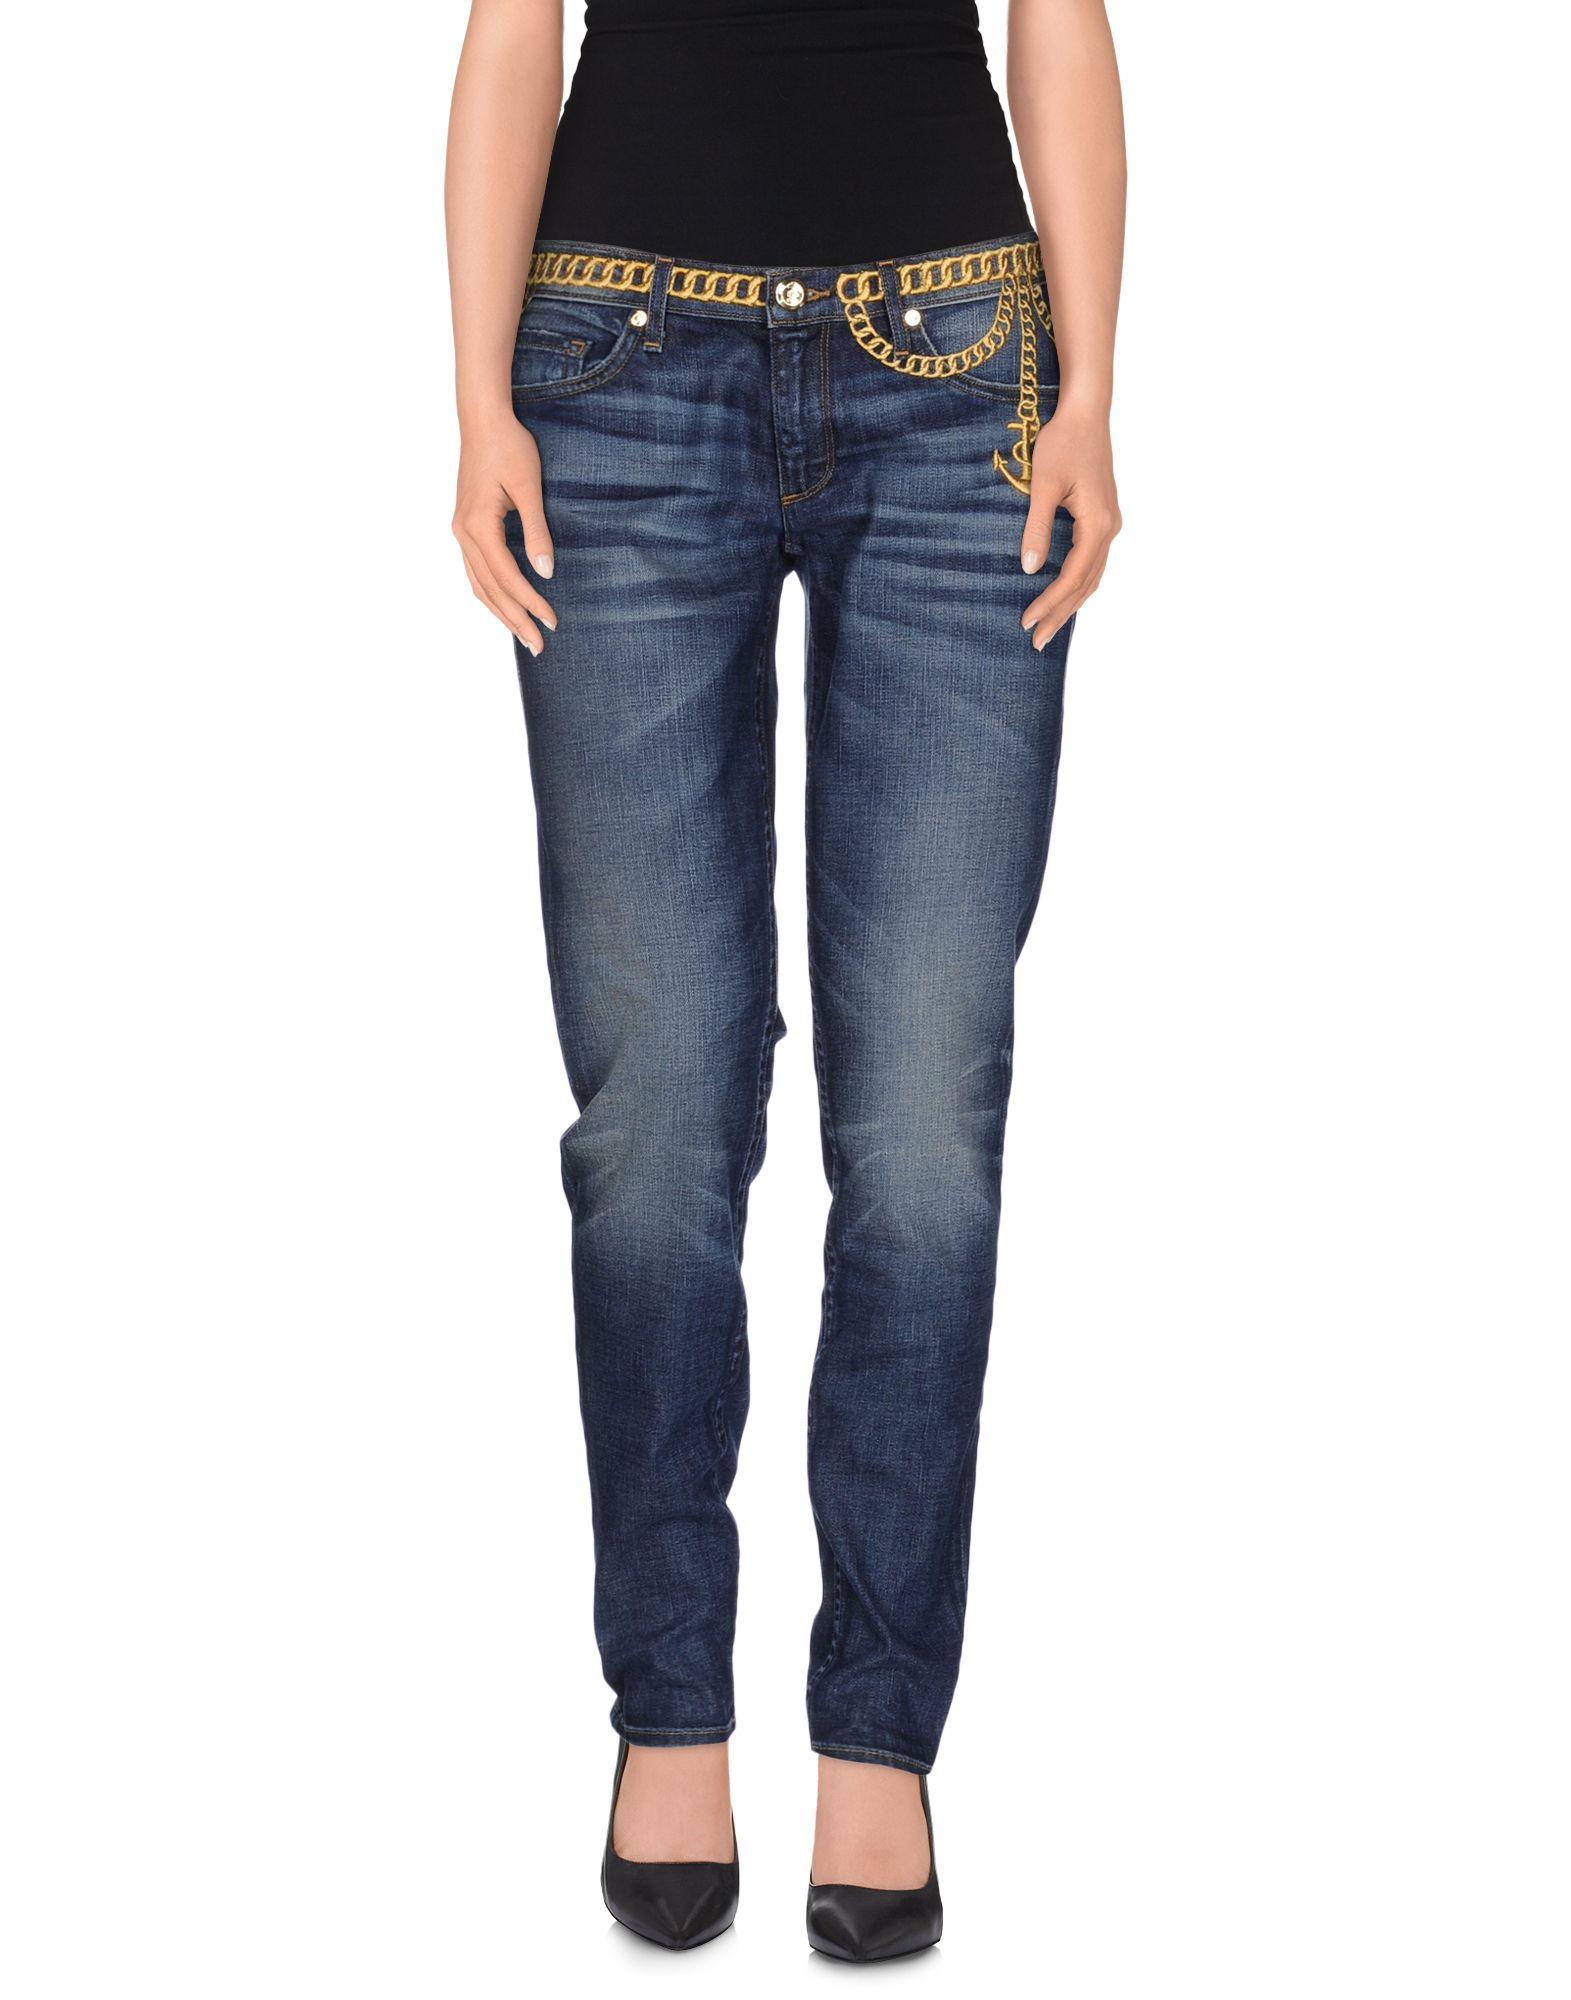 Juicy couture Denim Pants in Blue